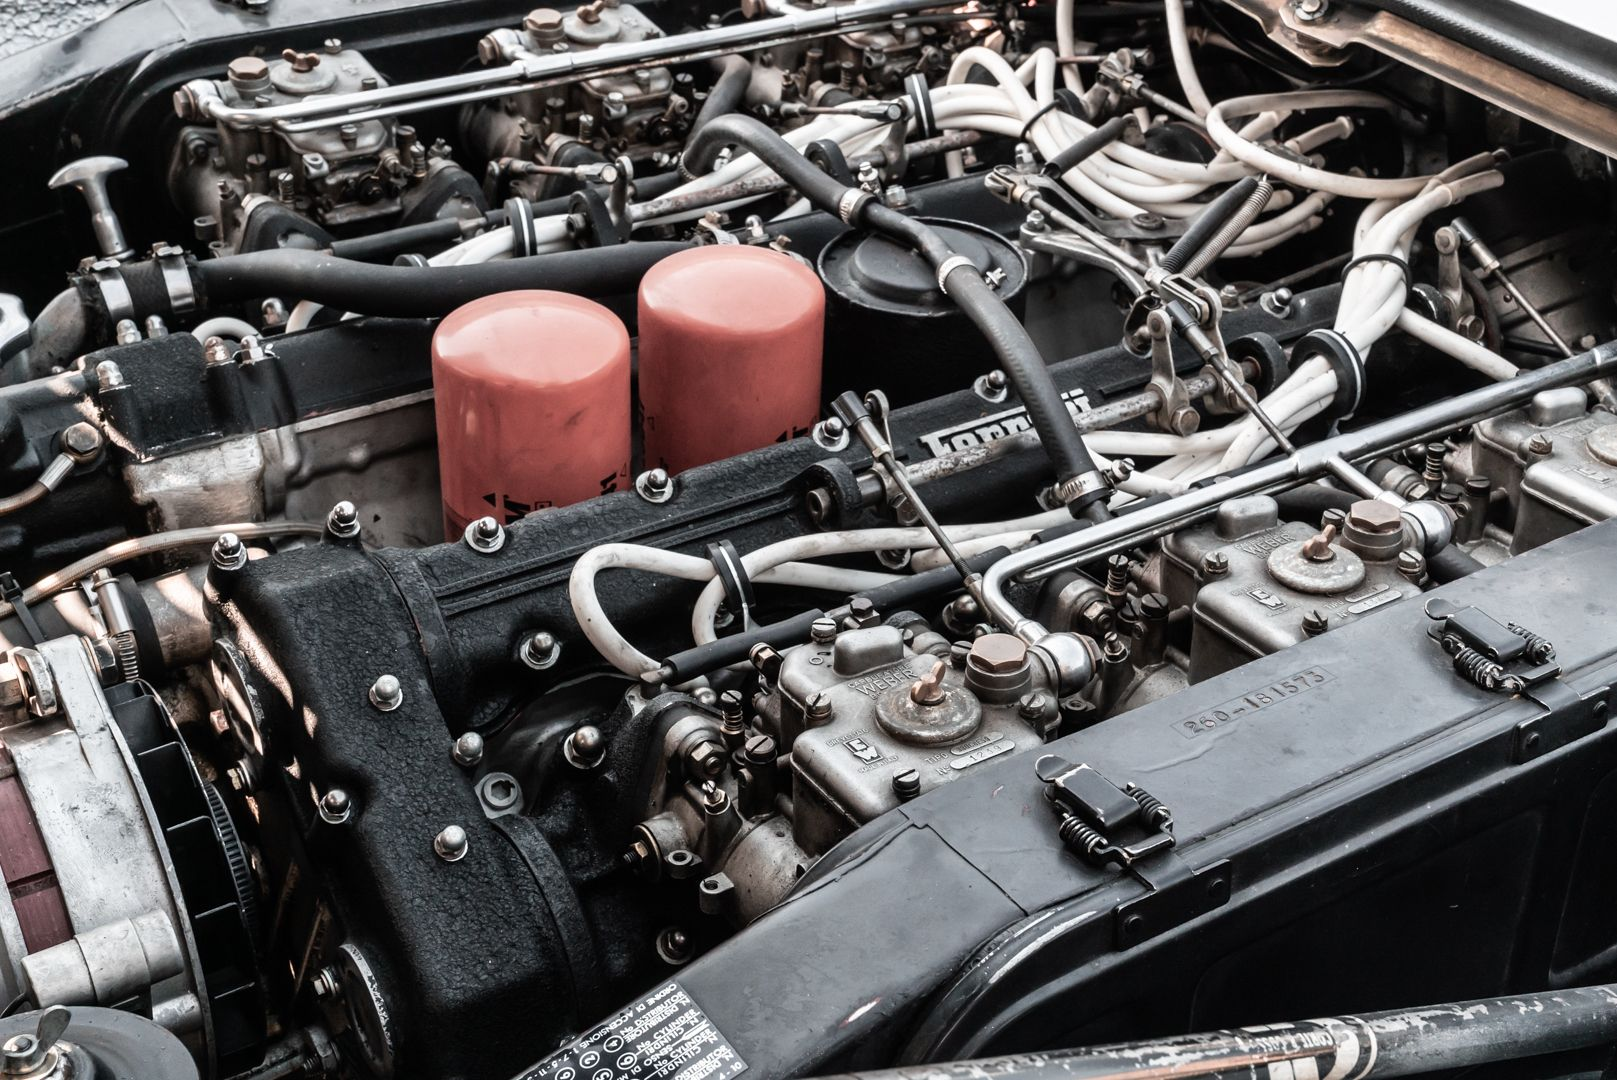 1973 Ferrari 365 GT4 2+2 81346